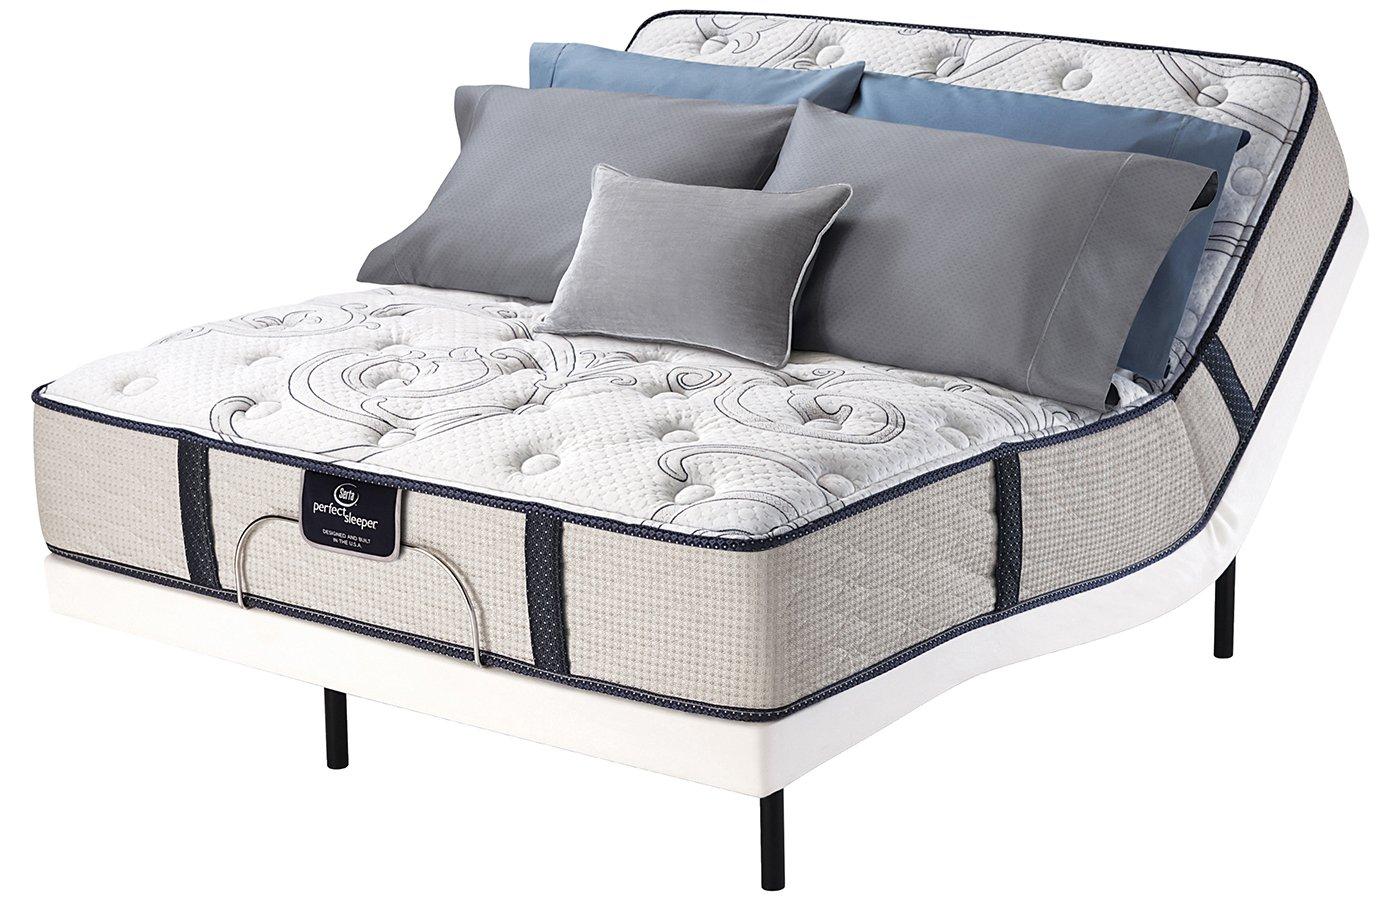 Queen Serta Perfect Sleeper Elite Fawnridge Plush Mattress